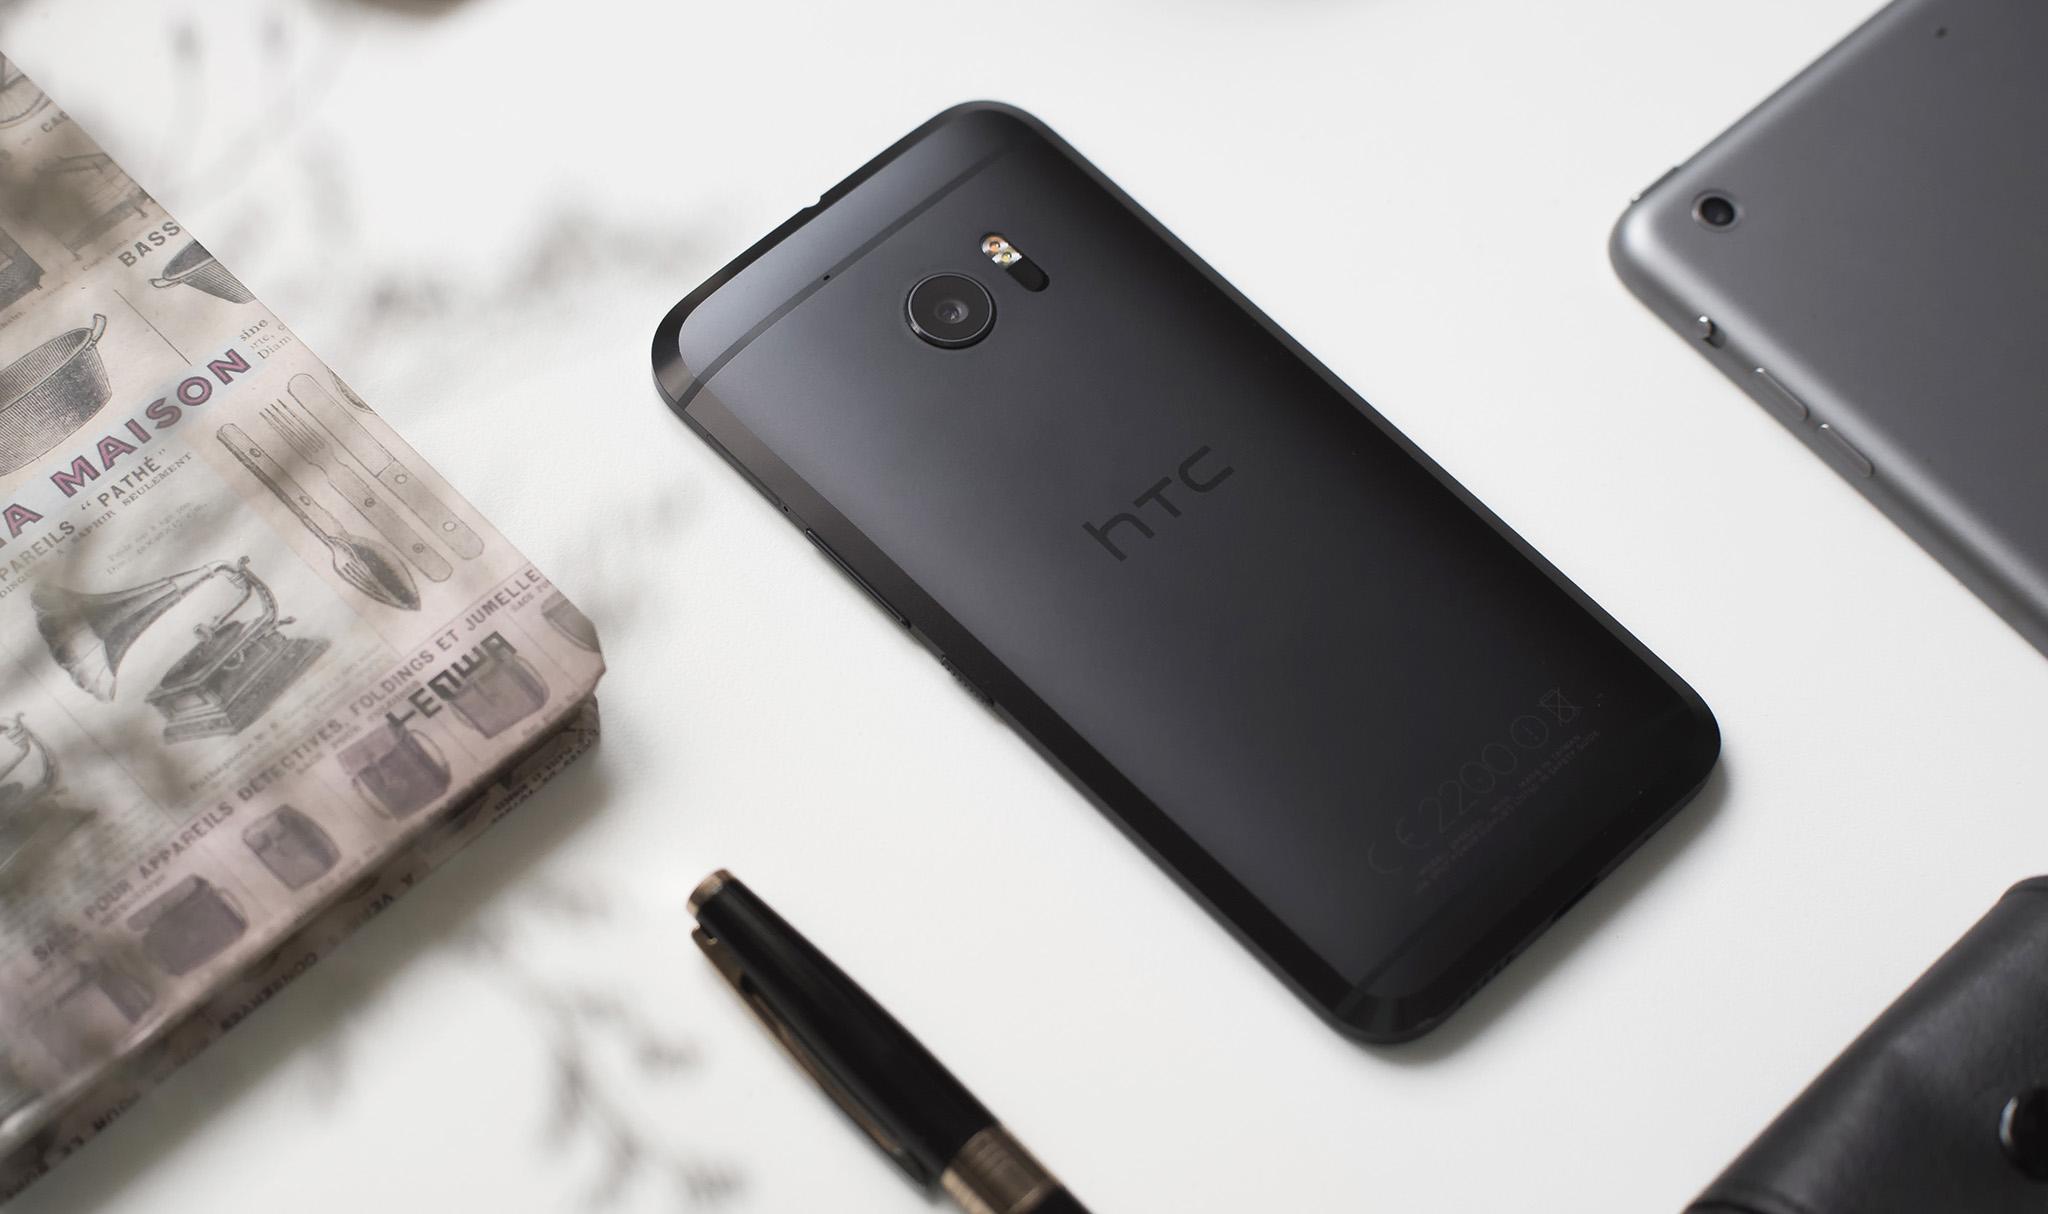 HTC_10_review.jpg